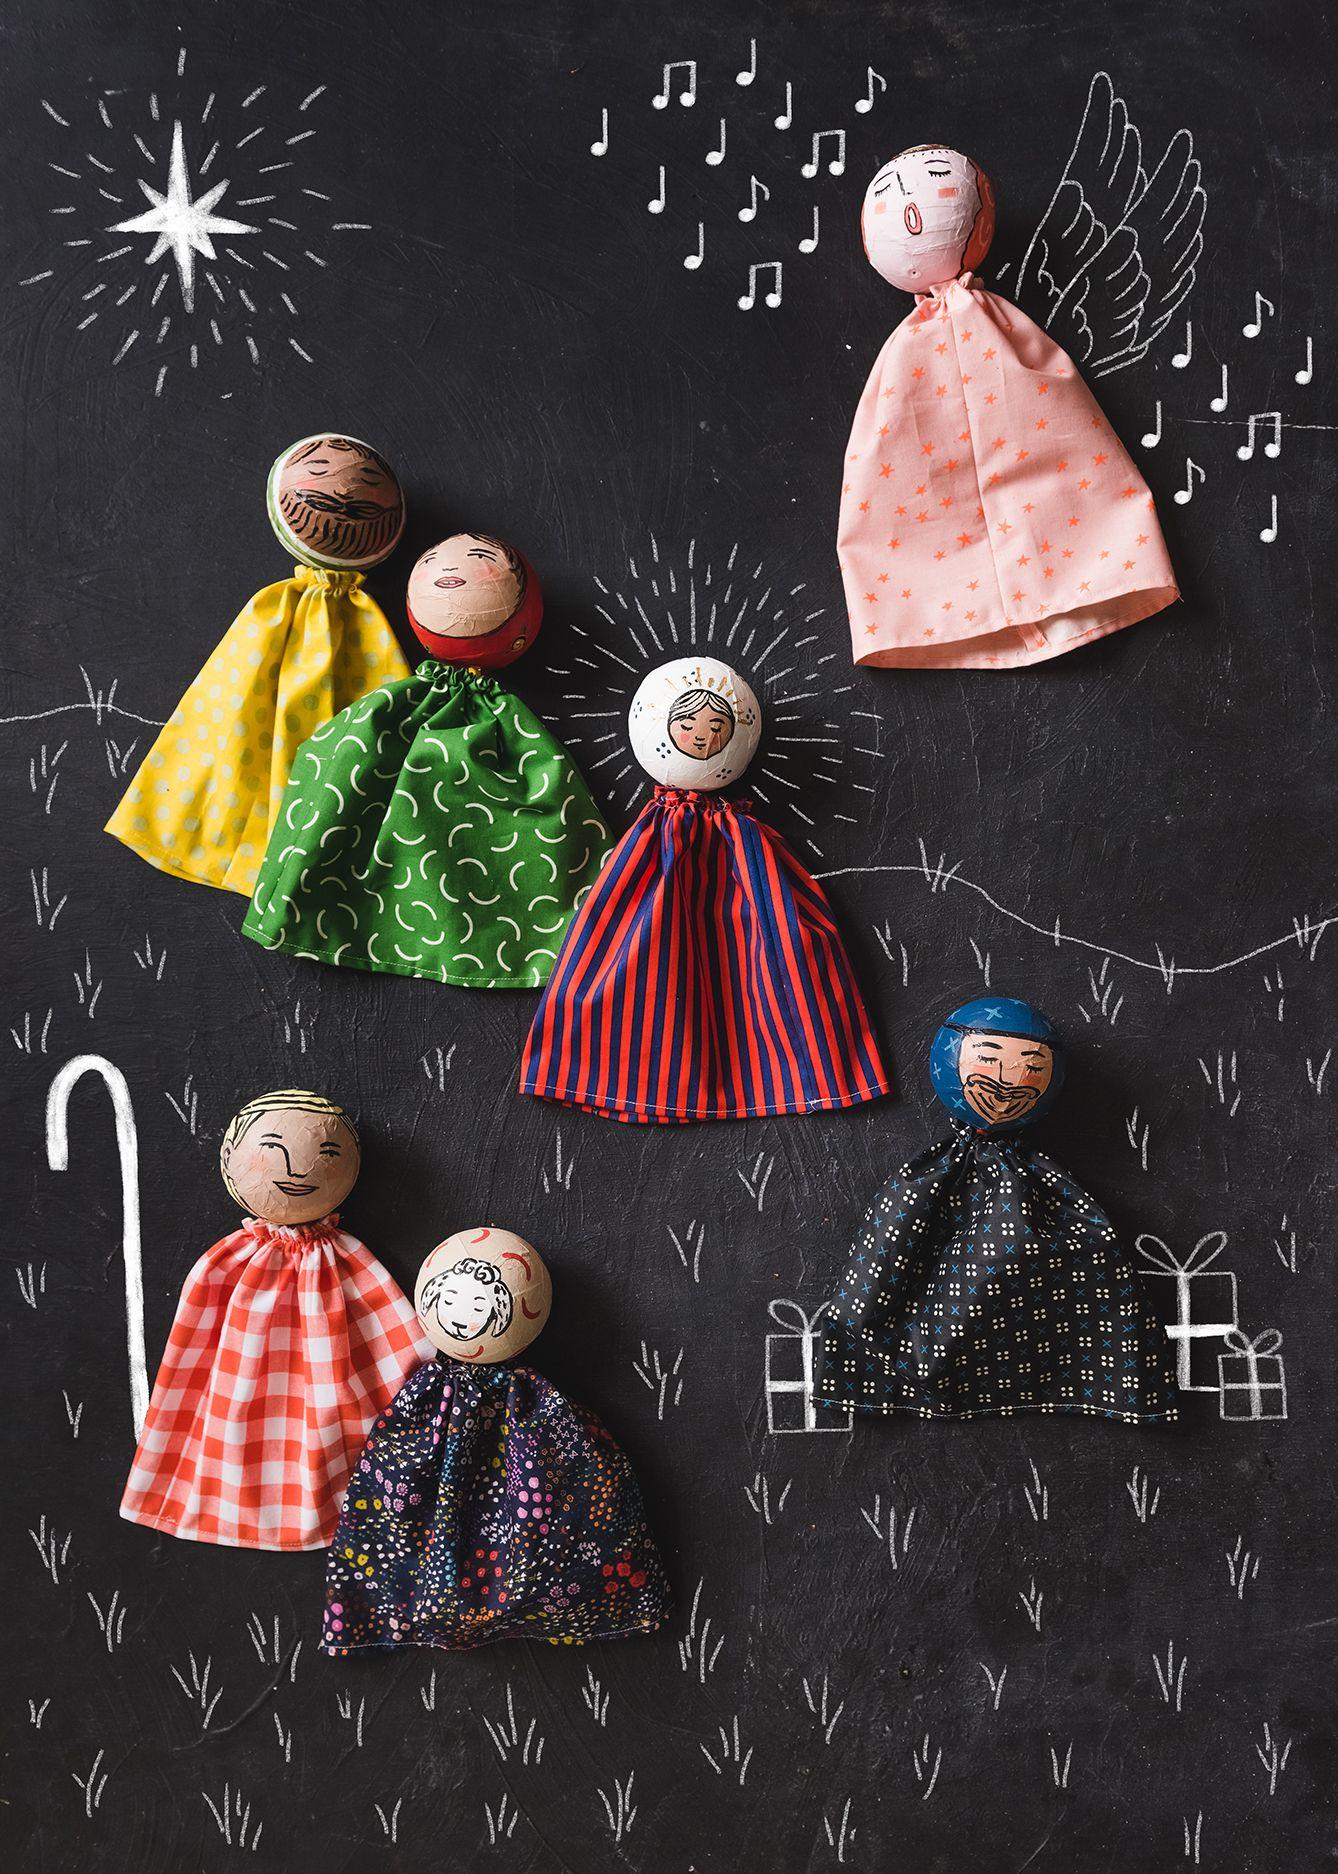 OUTDOOR 3D NATIVITY SET WOODWORKING PLAN YARD ART CHRISTMAS crafts 3 patterns